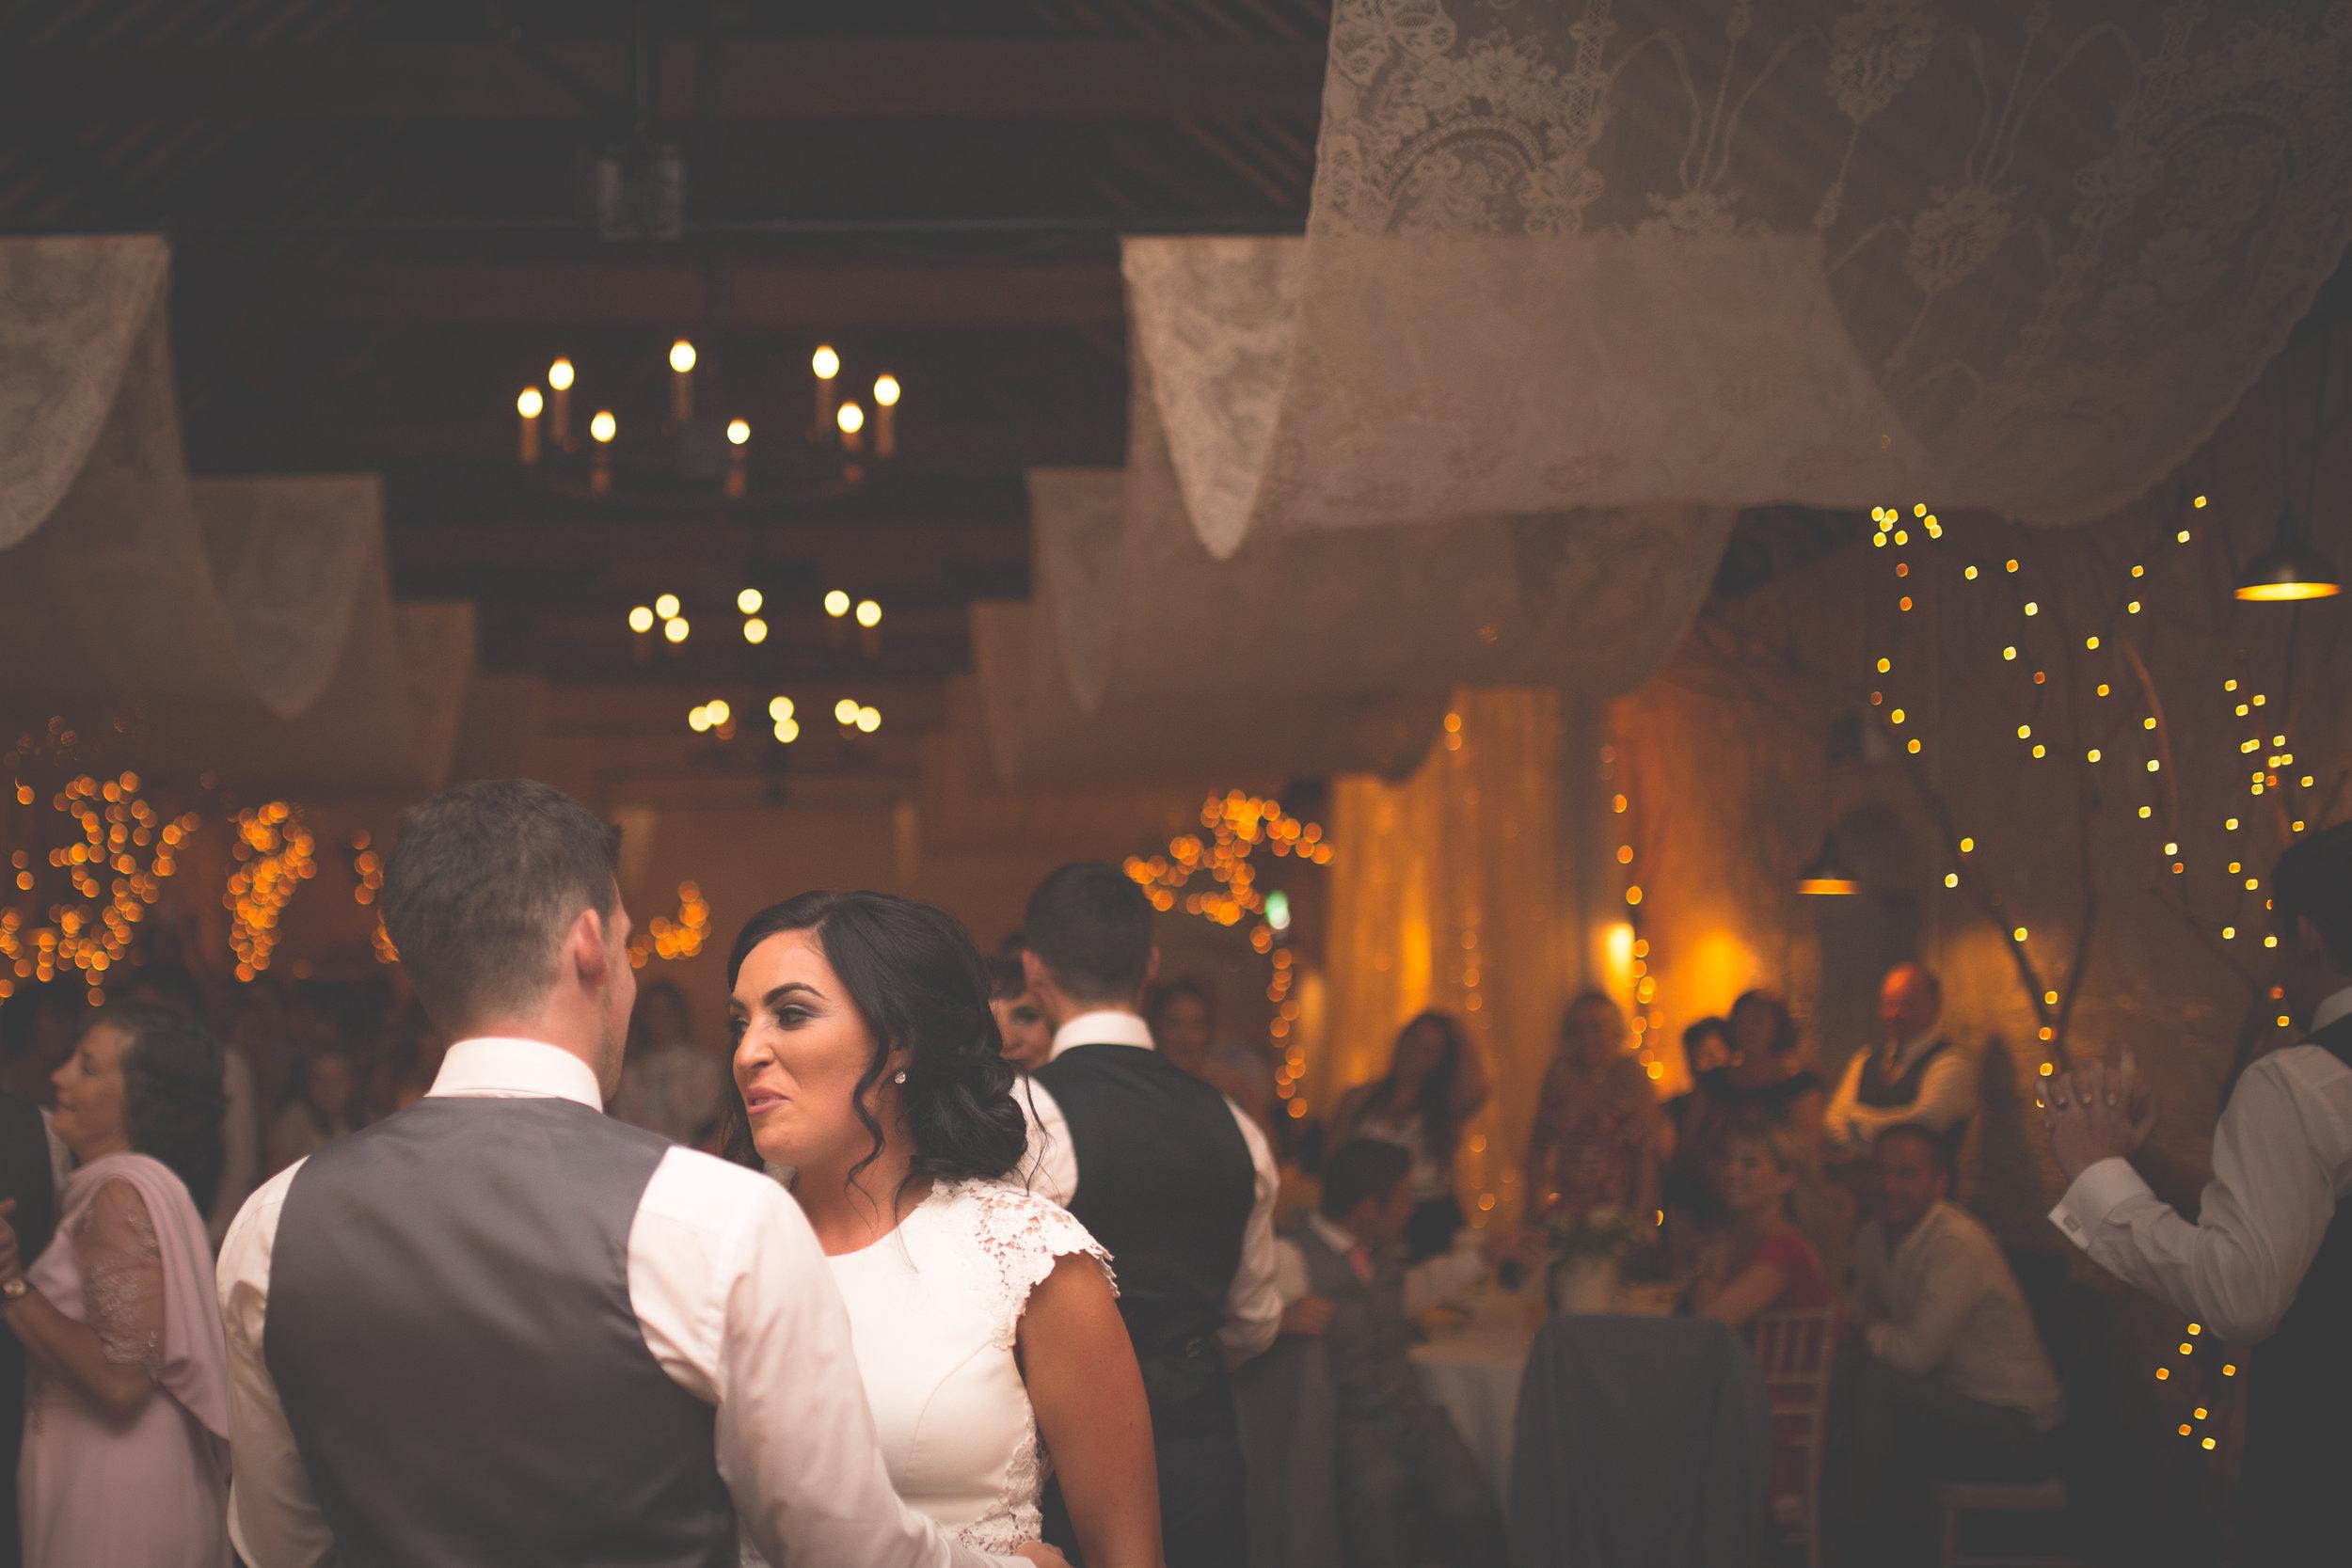 Brian McEwan Wedding Photography | Carol-Annee & Sean | The Dancing-50.jpg